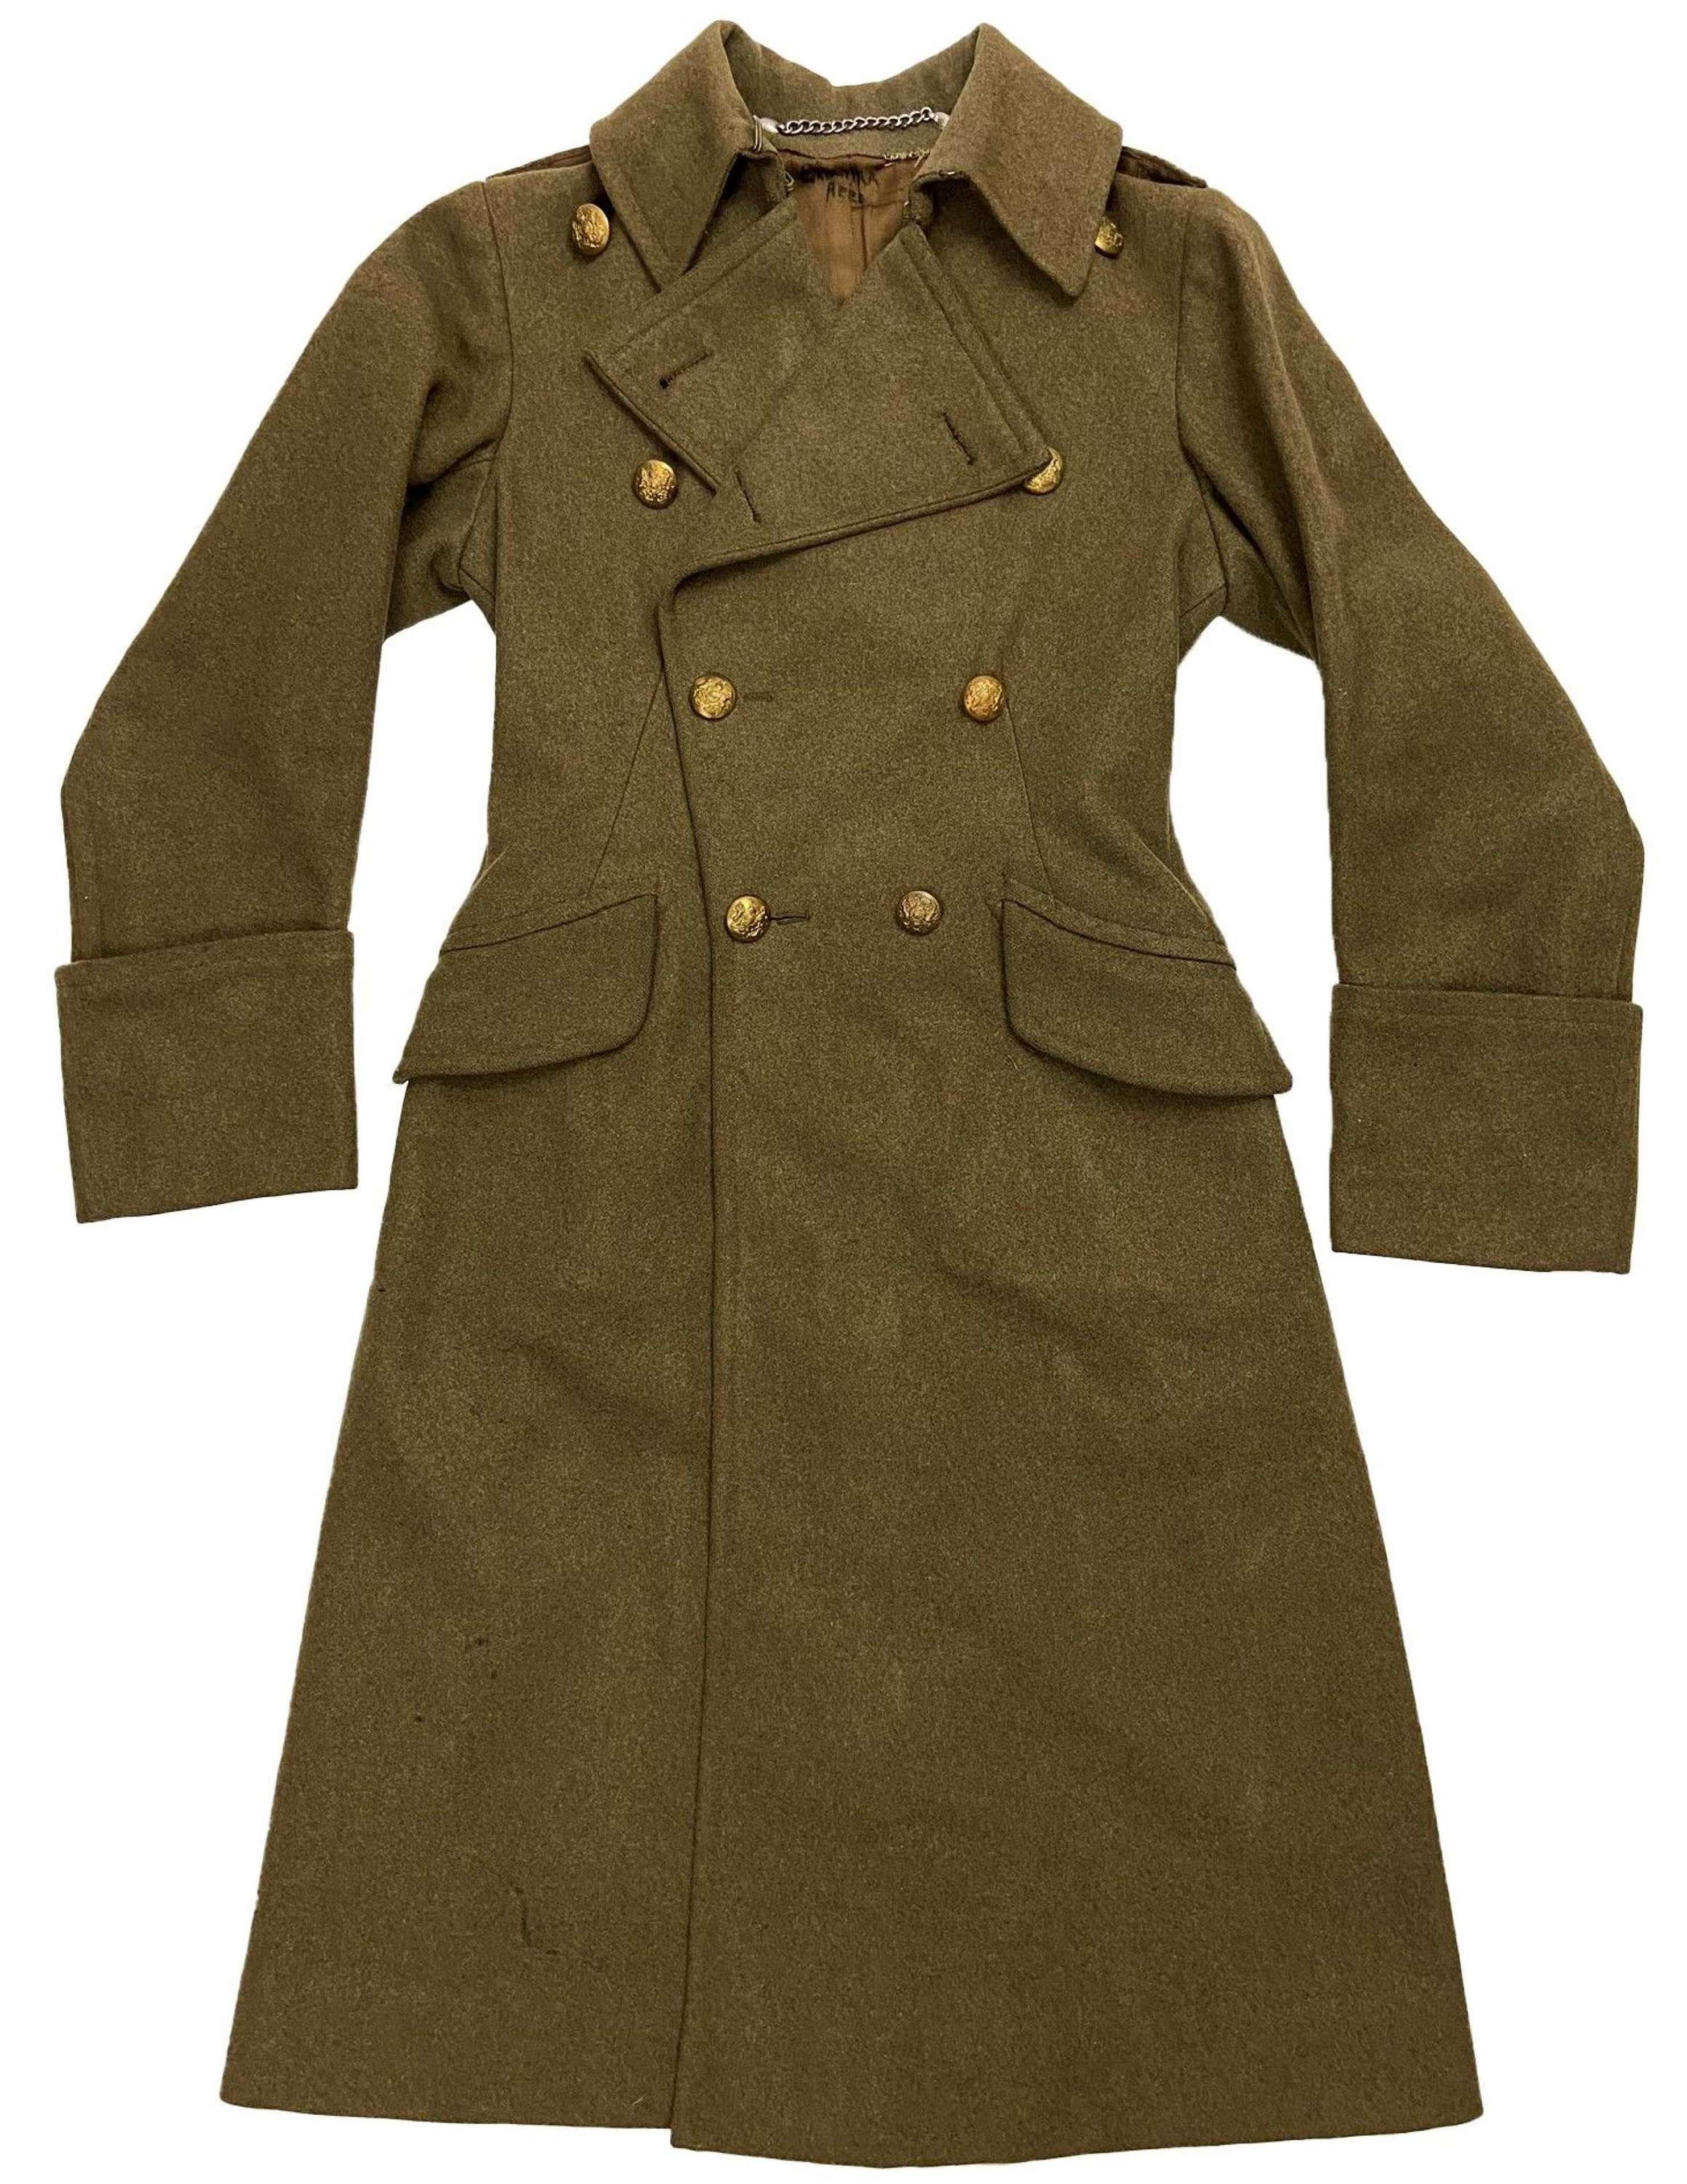 Original WW2 ATS Officers Greatcoat